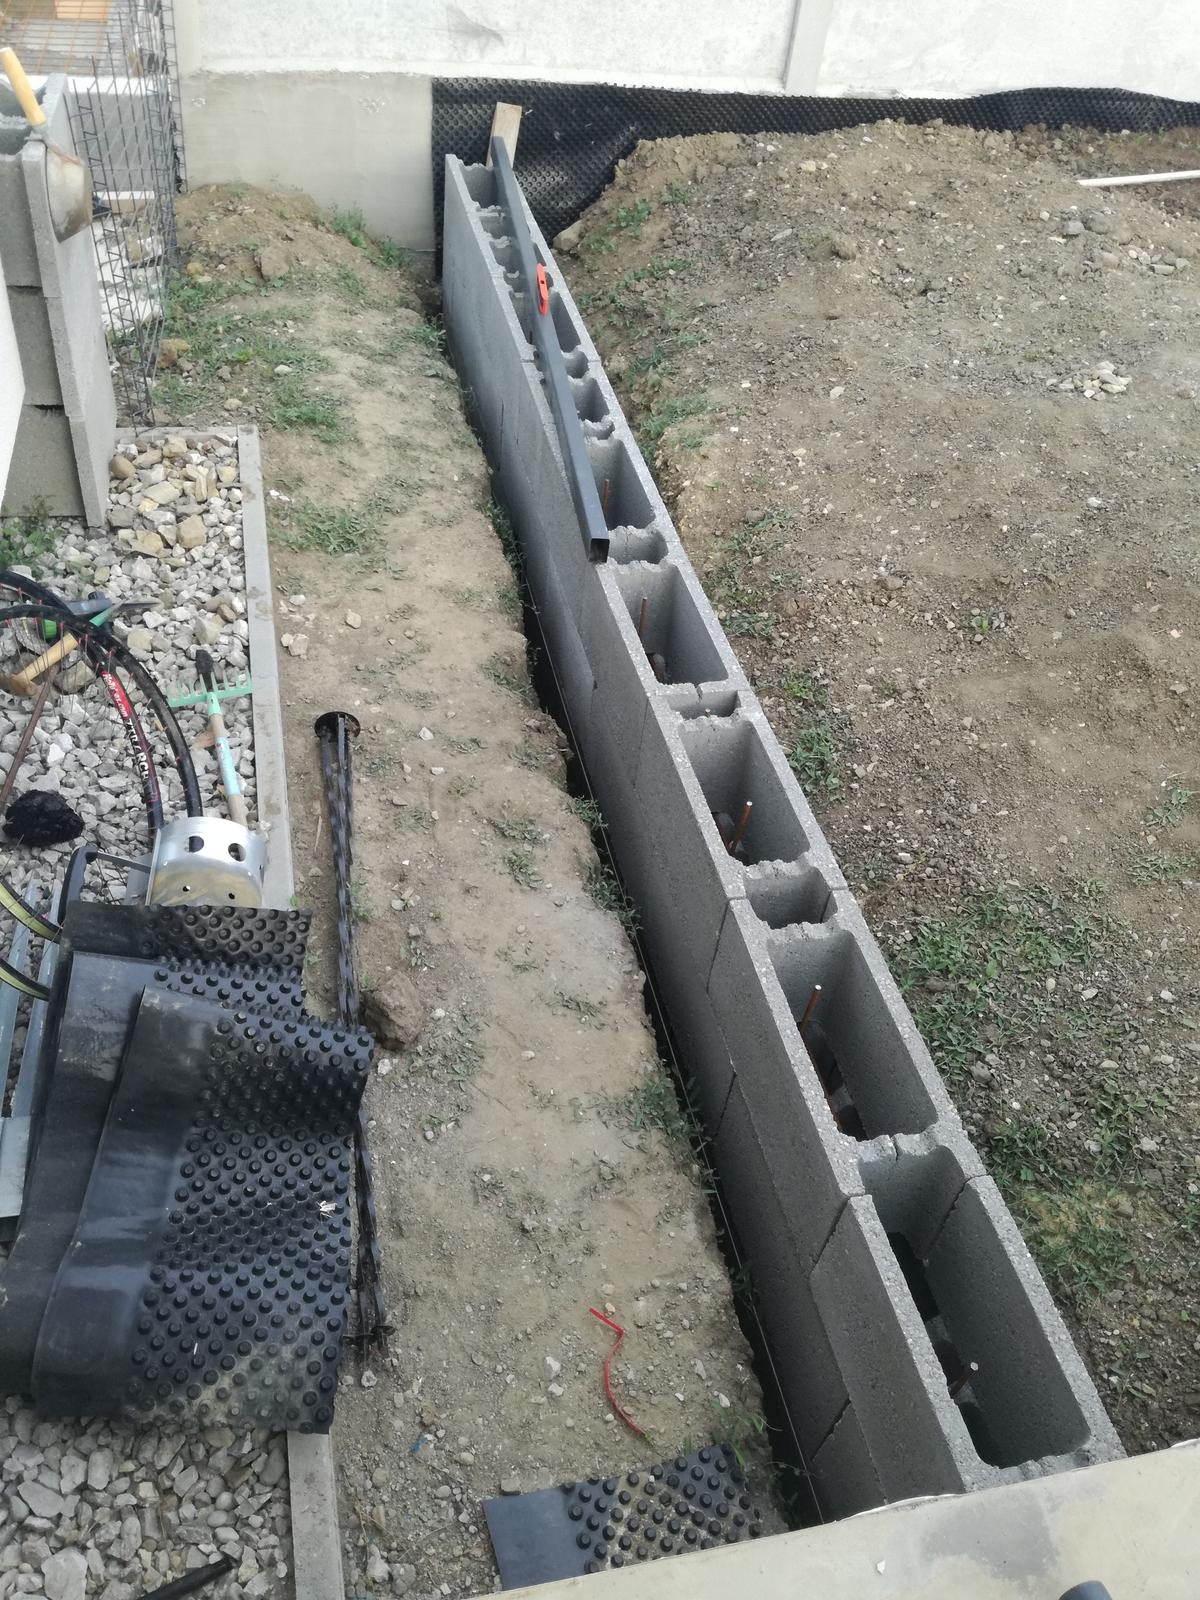 Minidomček pod Karpatmi - lava strana terasy, murik pre zvysenu zednu cast pozemku. este podorovnavat a zaliat